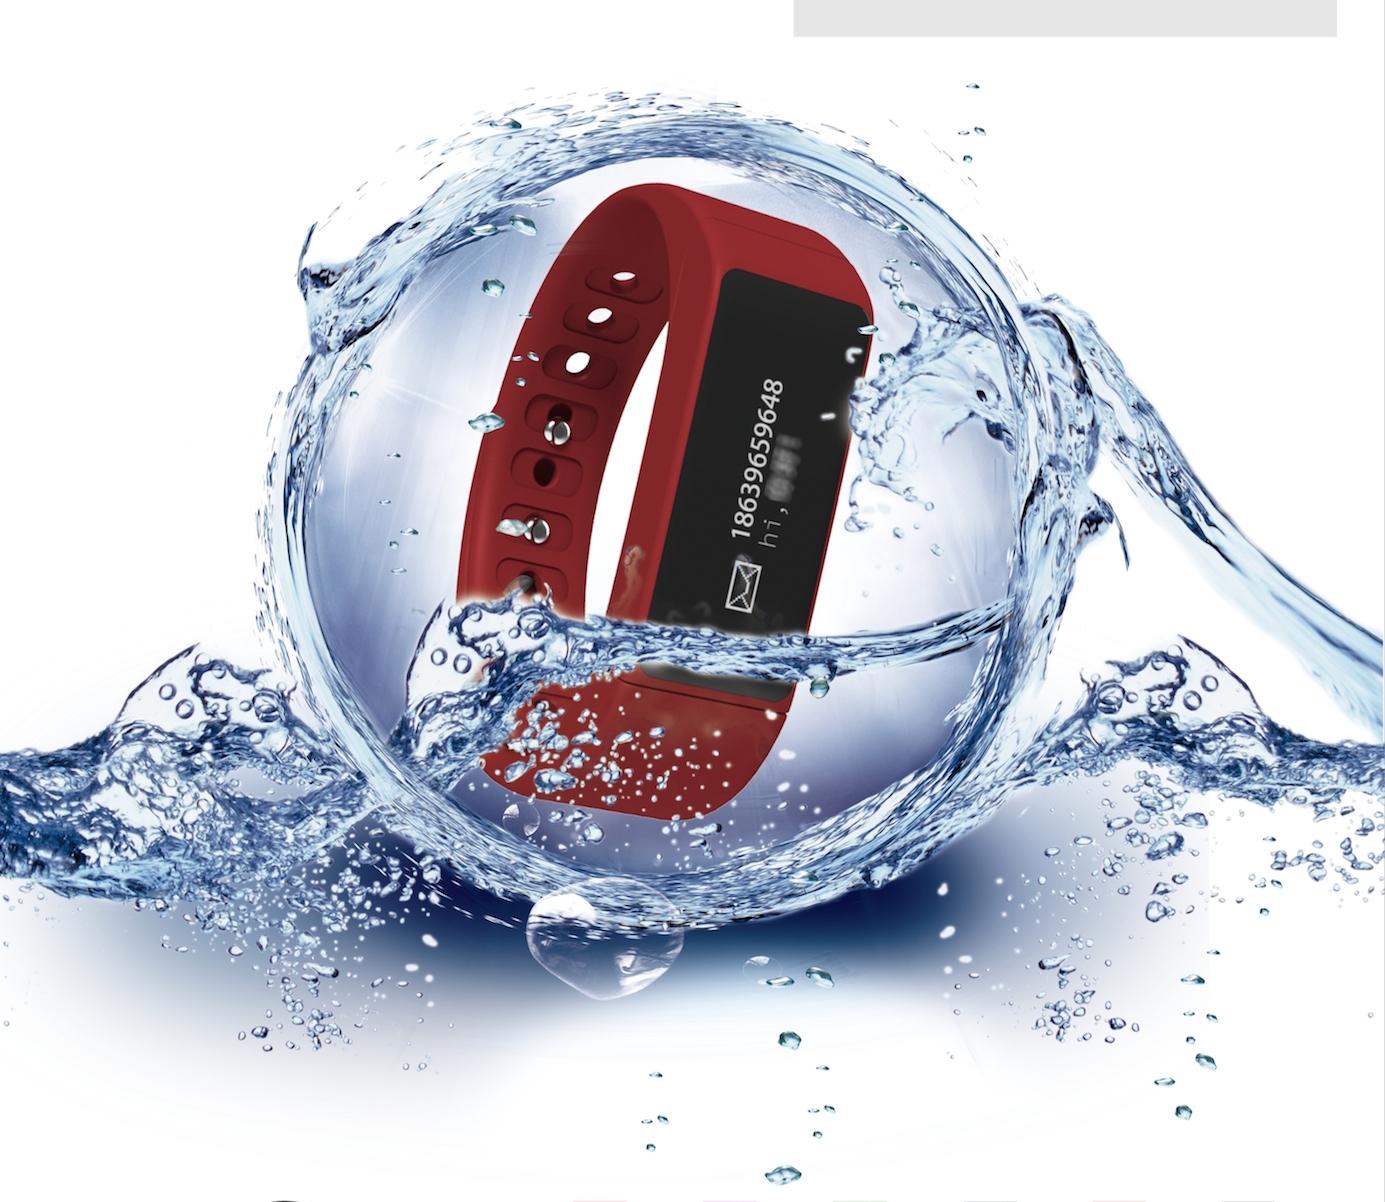 Ip67 waterproof 72dpi